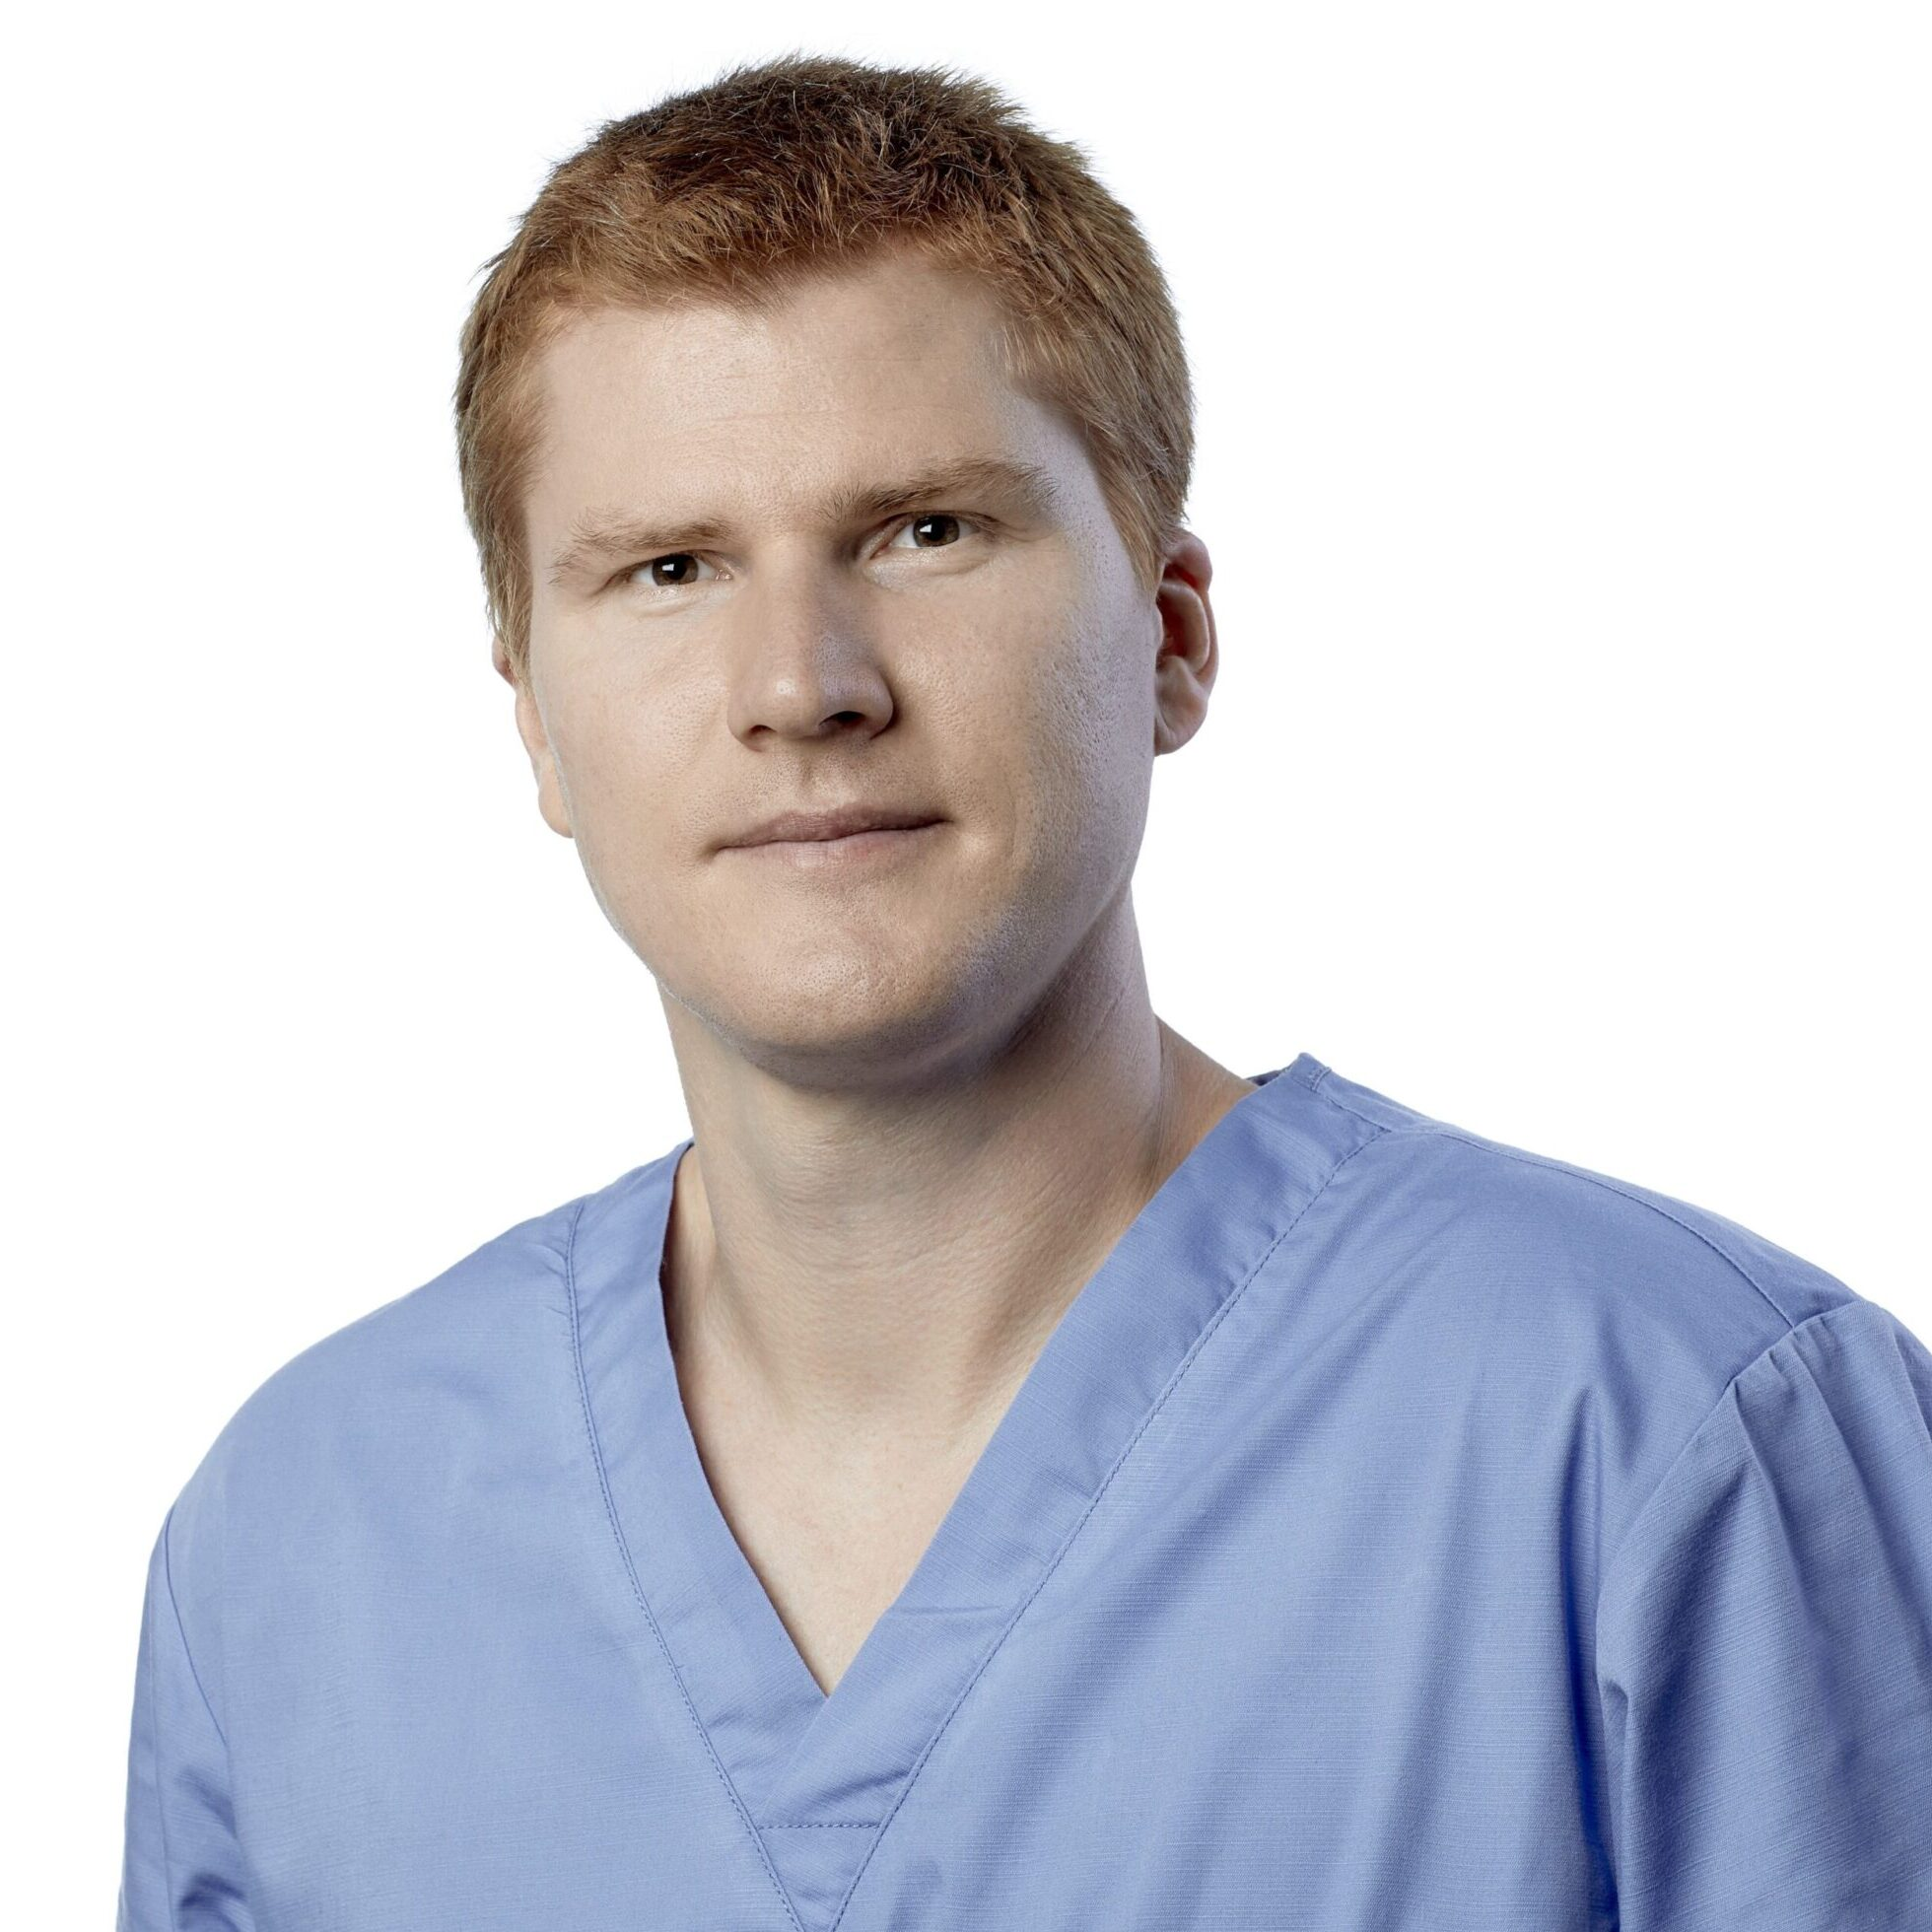 Dr. Juris Altroks